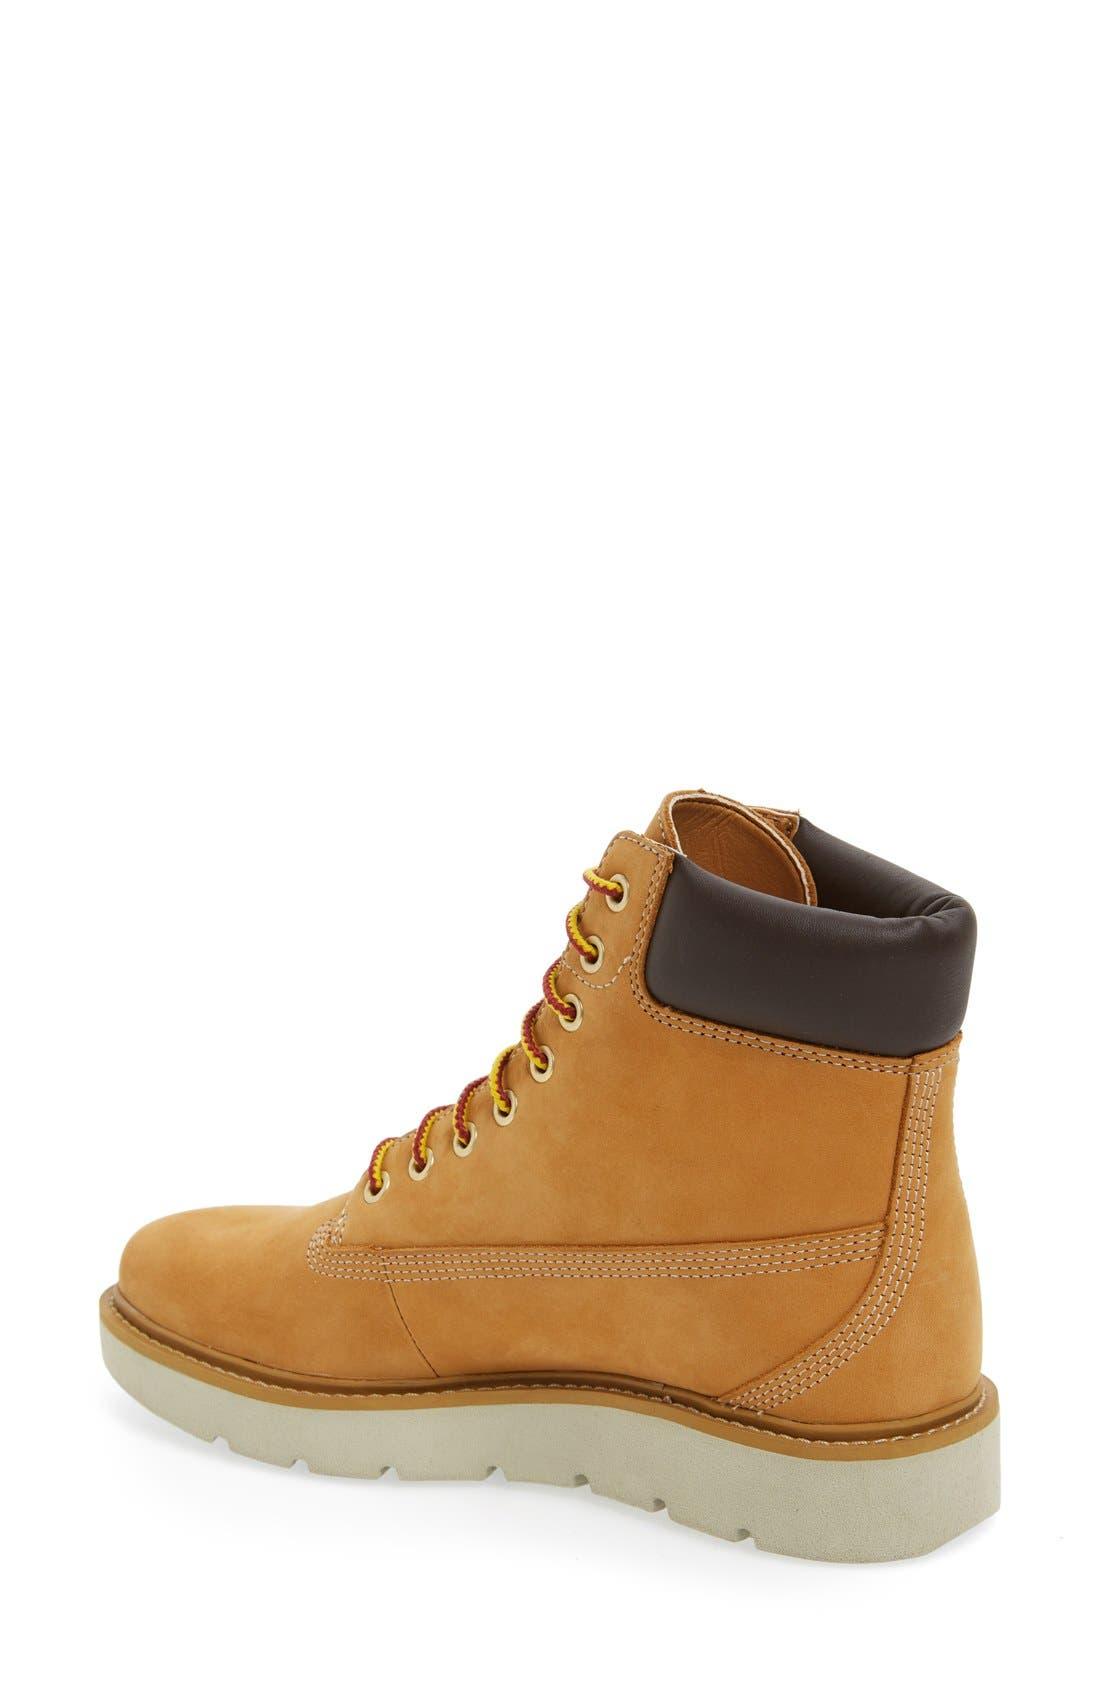 Alternate Image 2  - Timberland 'Kenniston' Lace-Up Boot (Women)